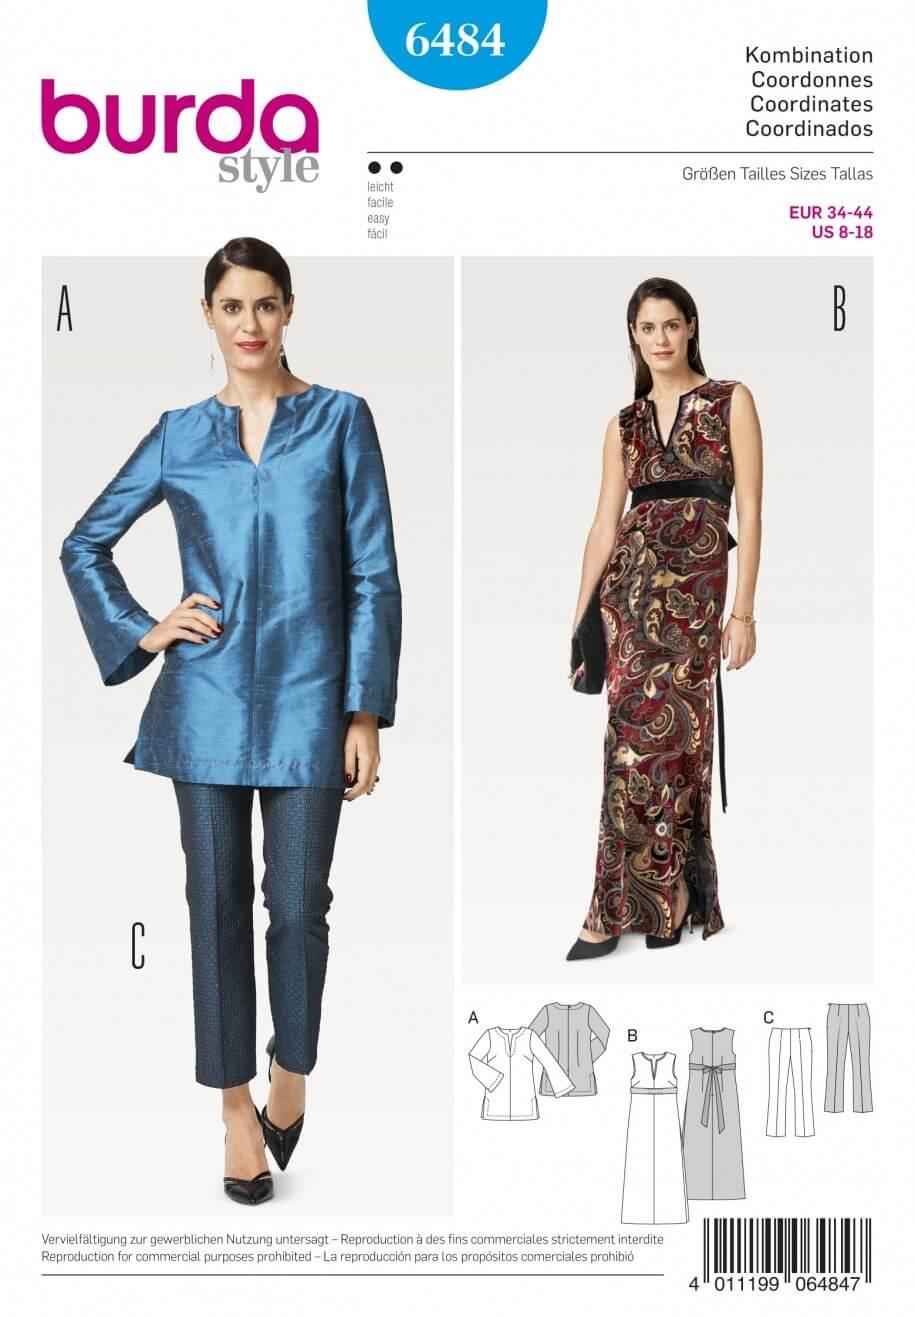 Burda Style Women's Evening Attires Dress, Top & Bottoms Sewing Pattern 6484